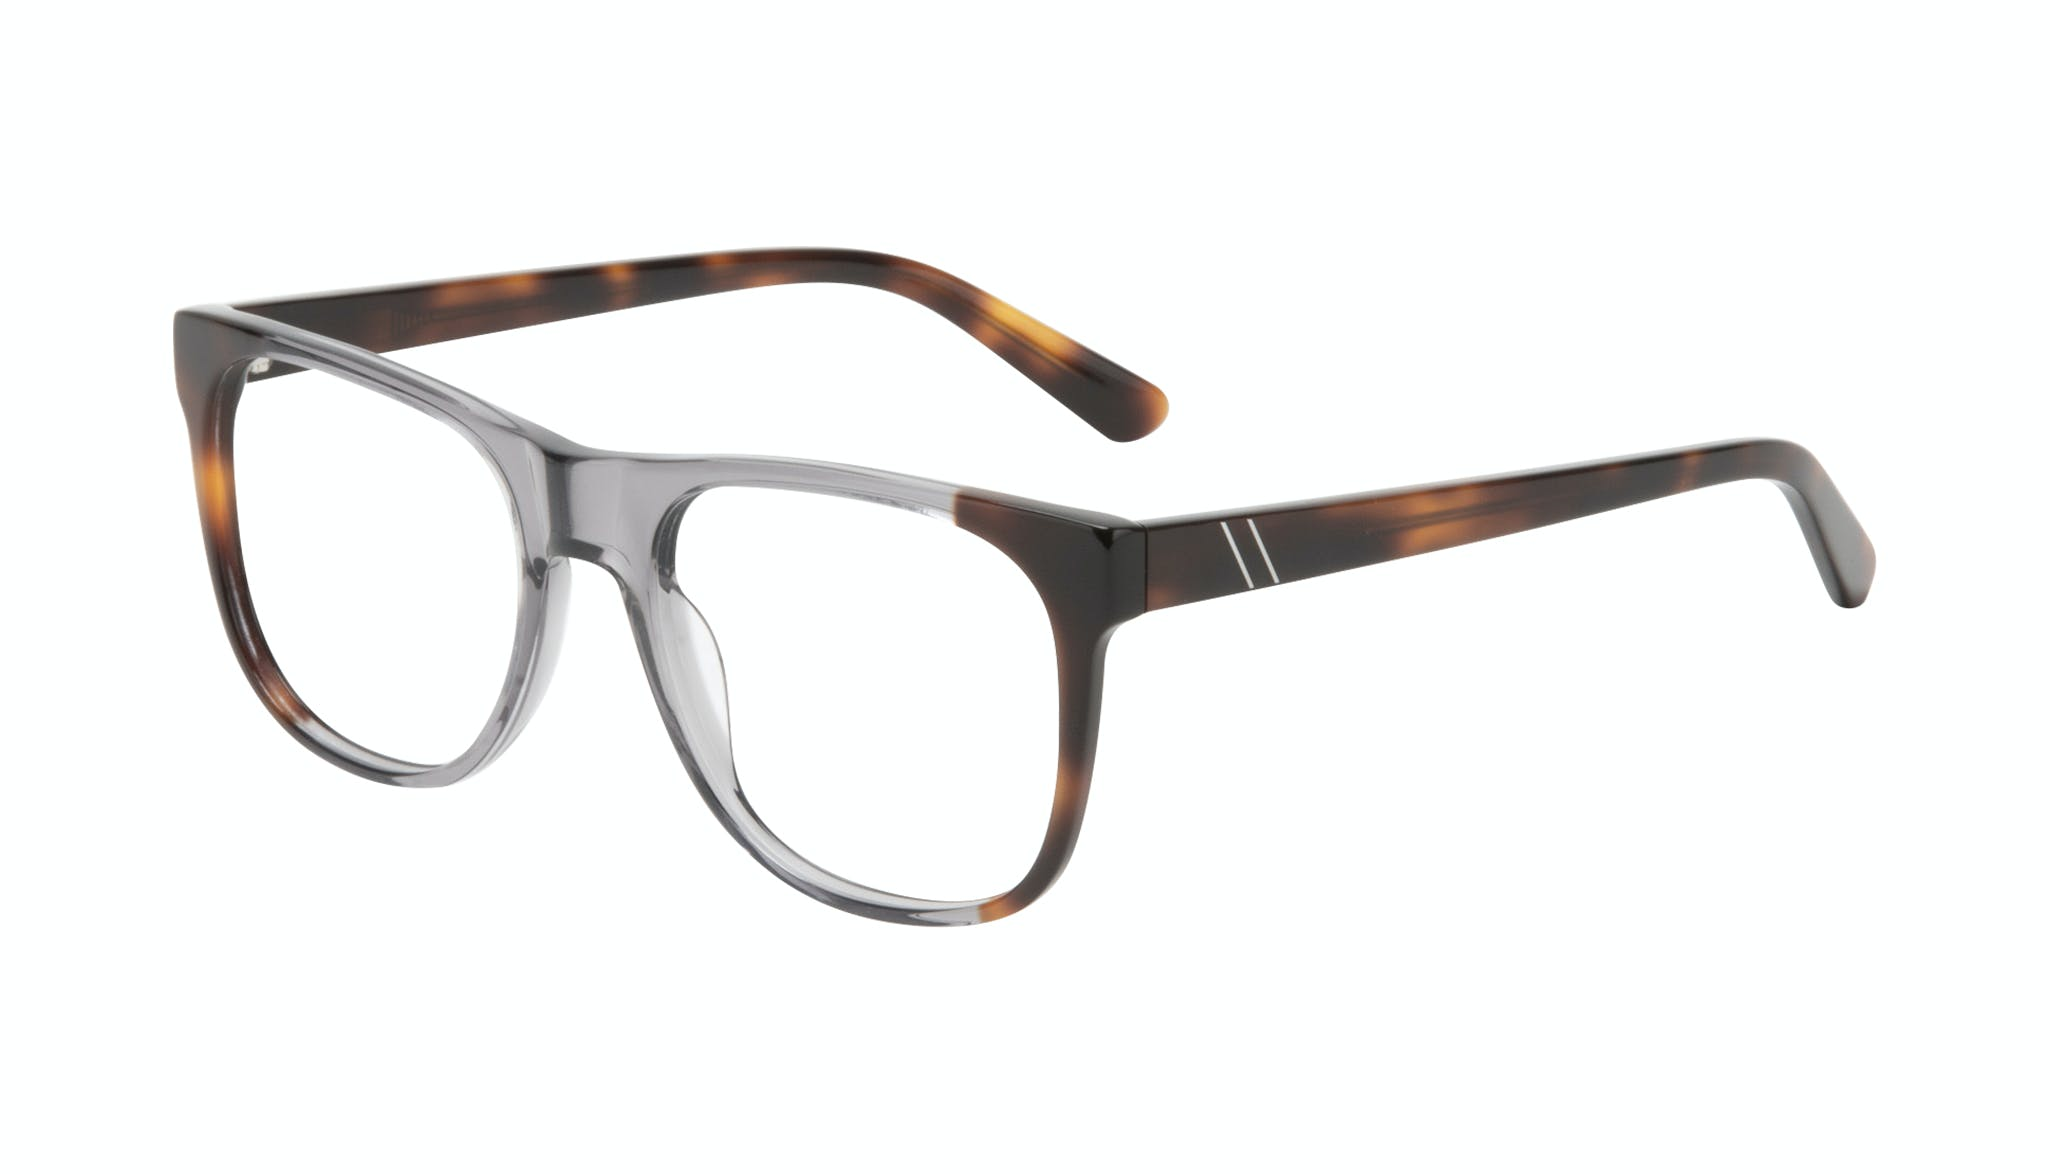 Affordable Fashion Glasses Square Eyeglasses Men Make Smokey Tort Tilt